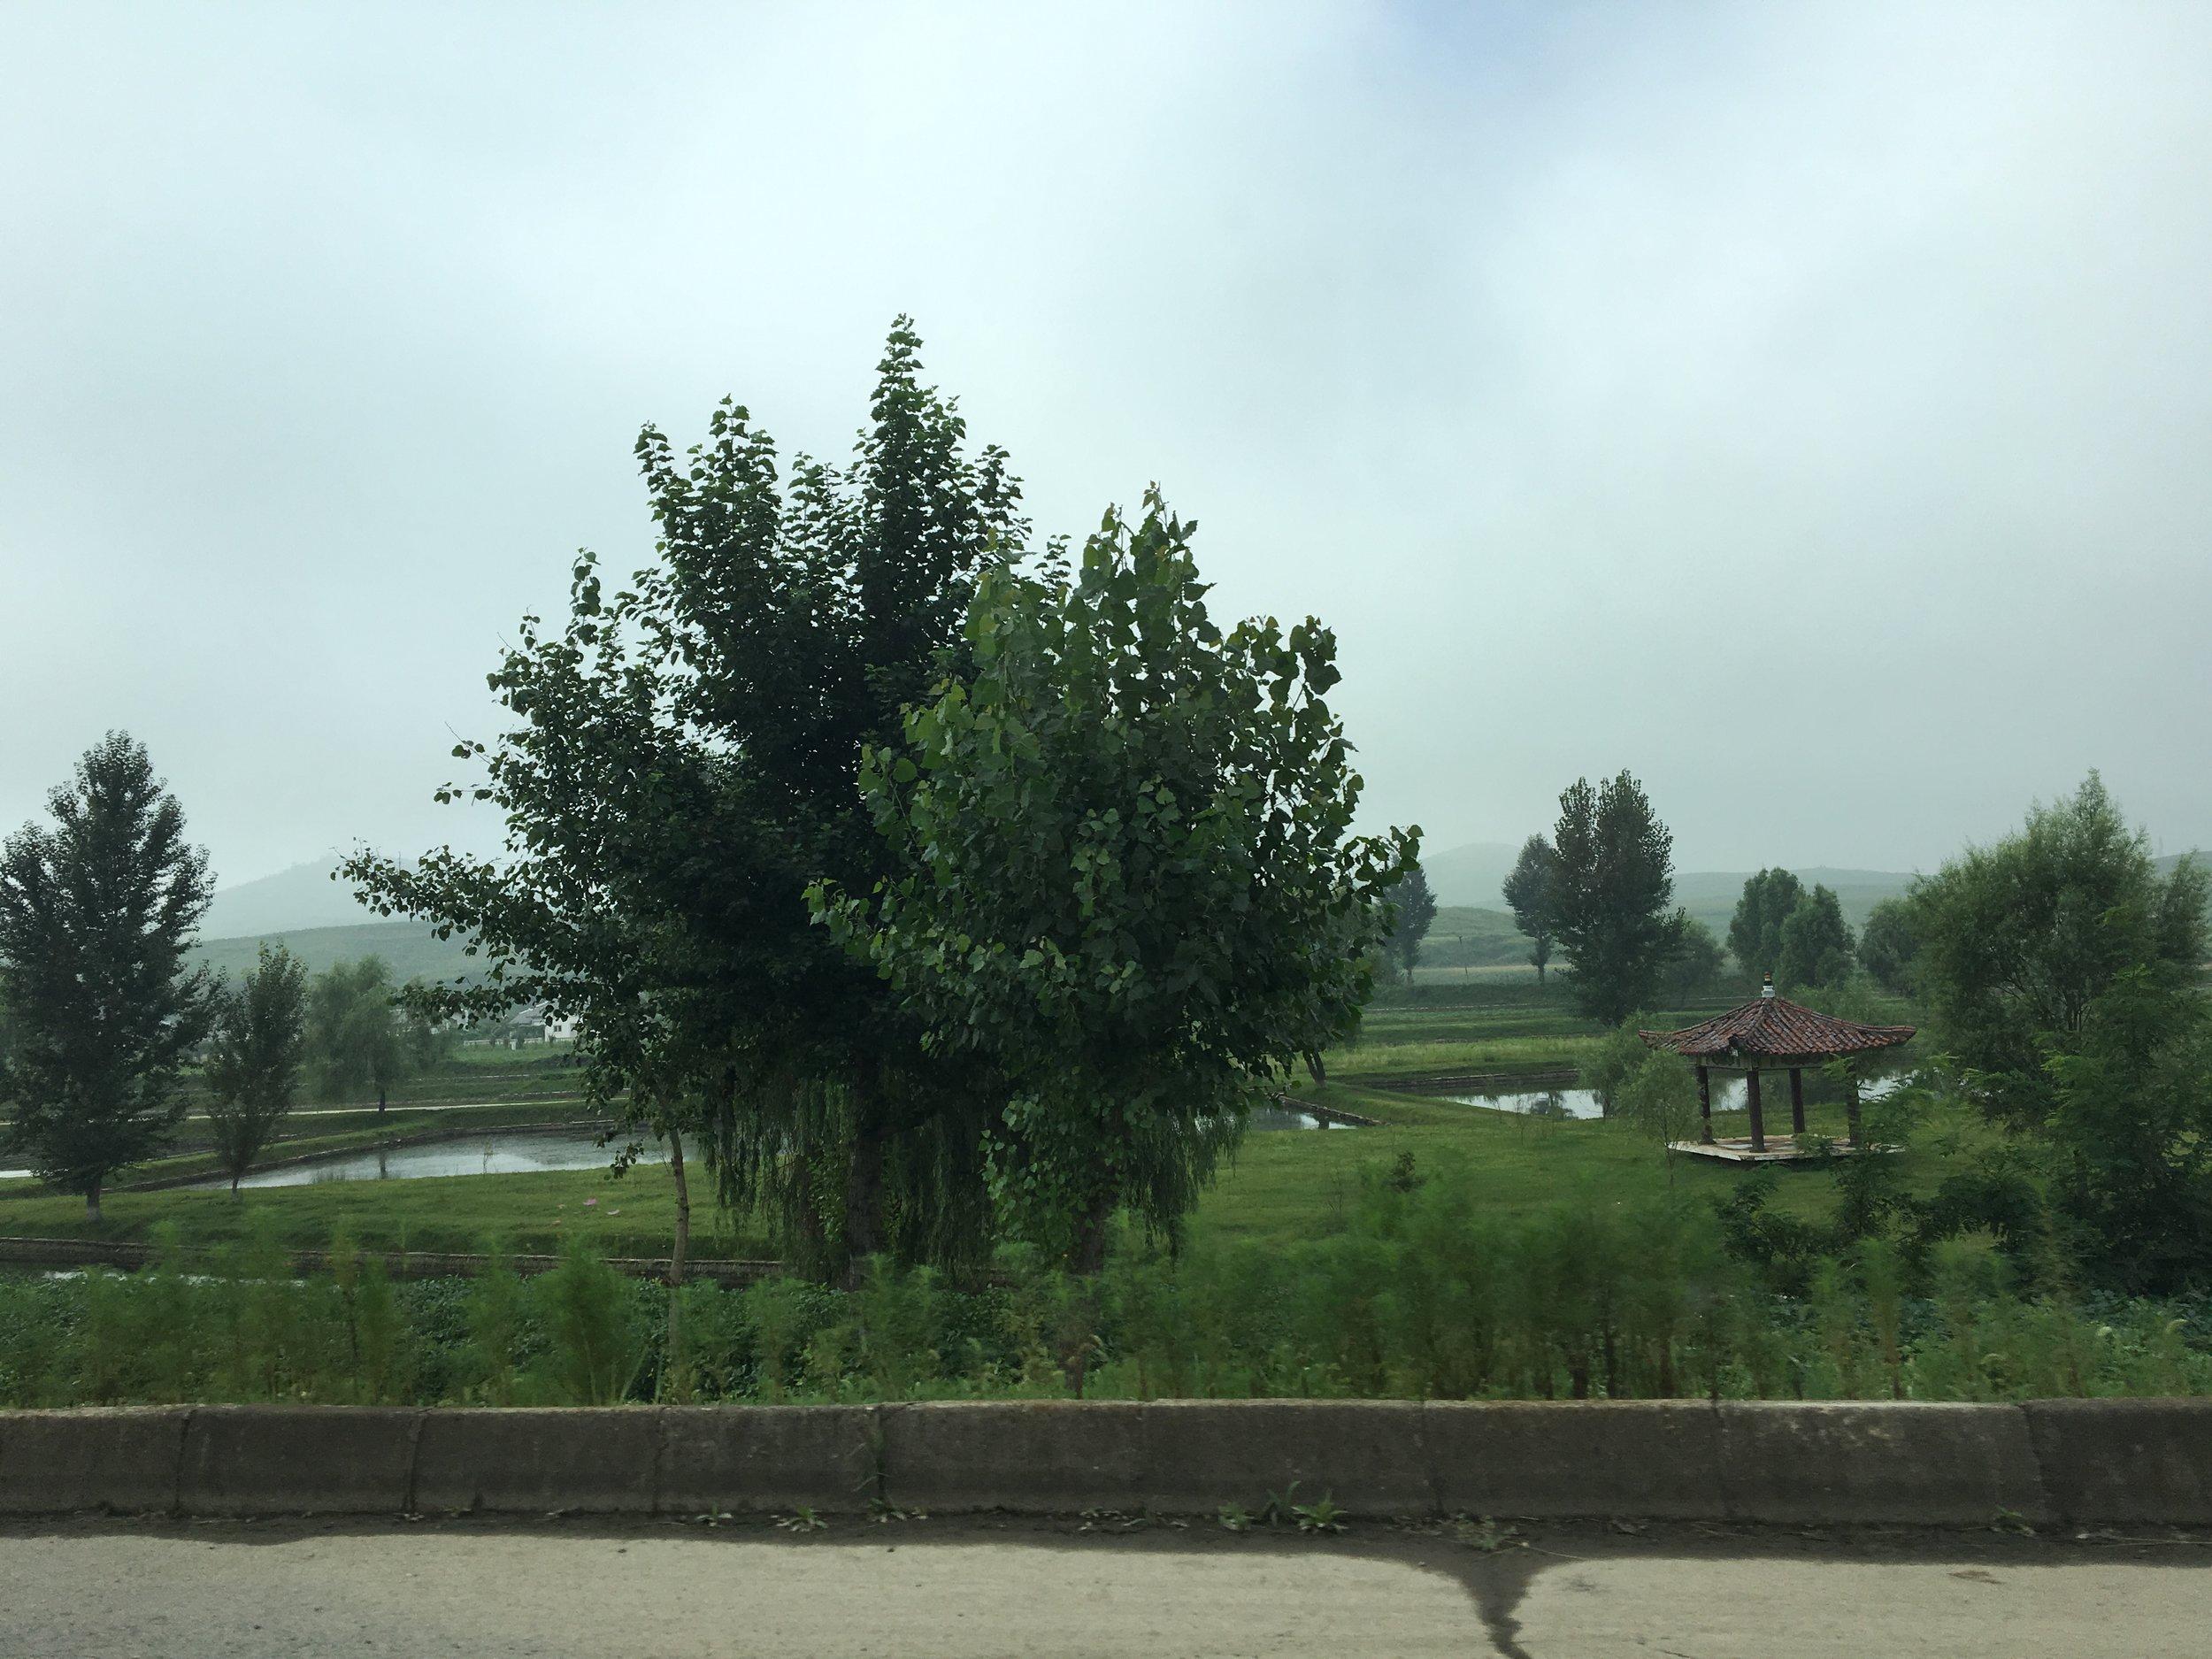 Countryside between Pyongyang and Kaesong